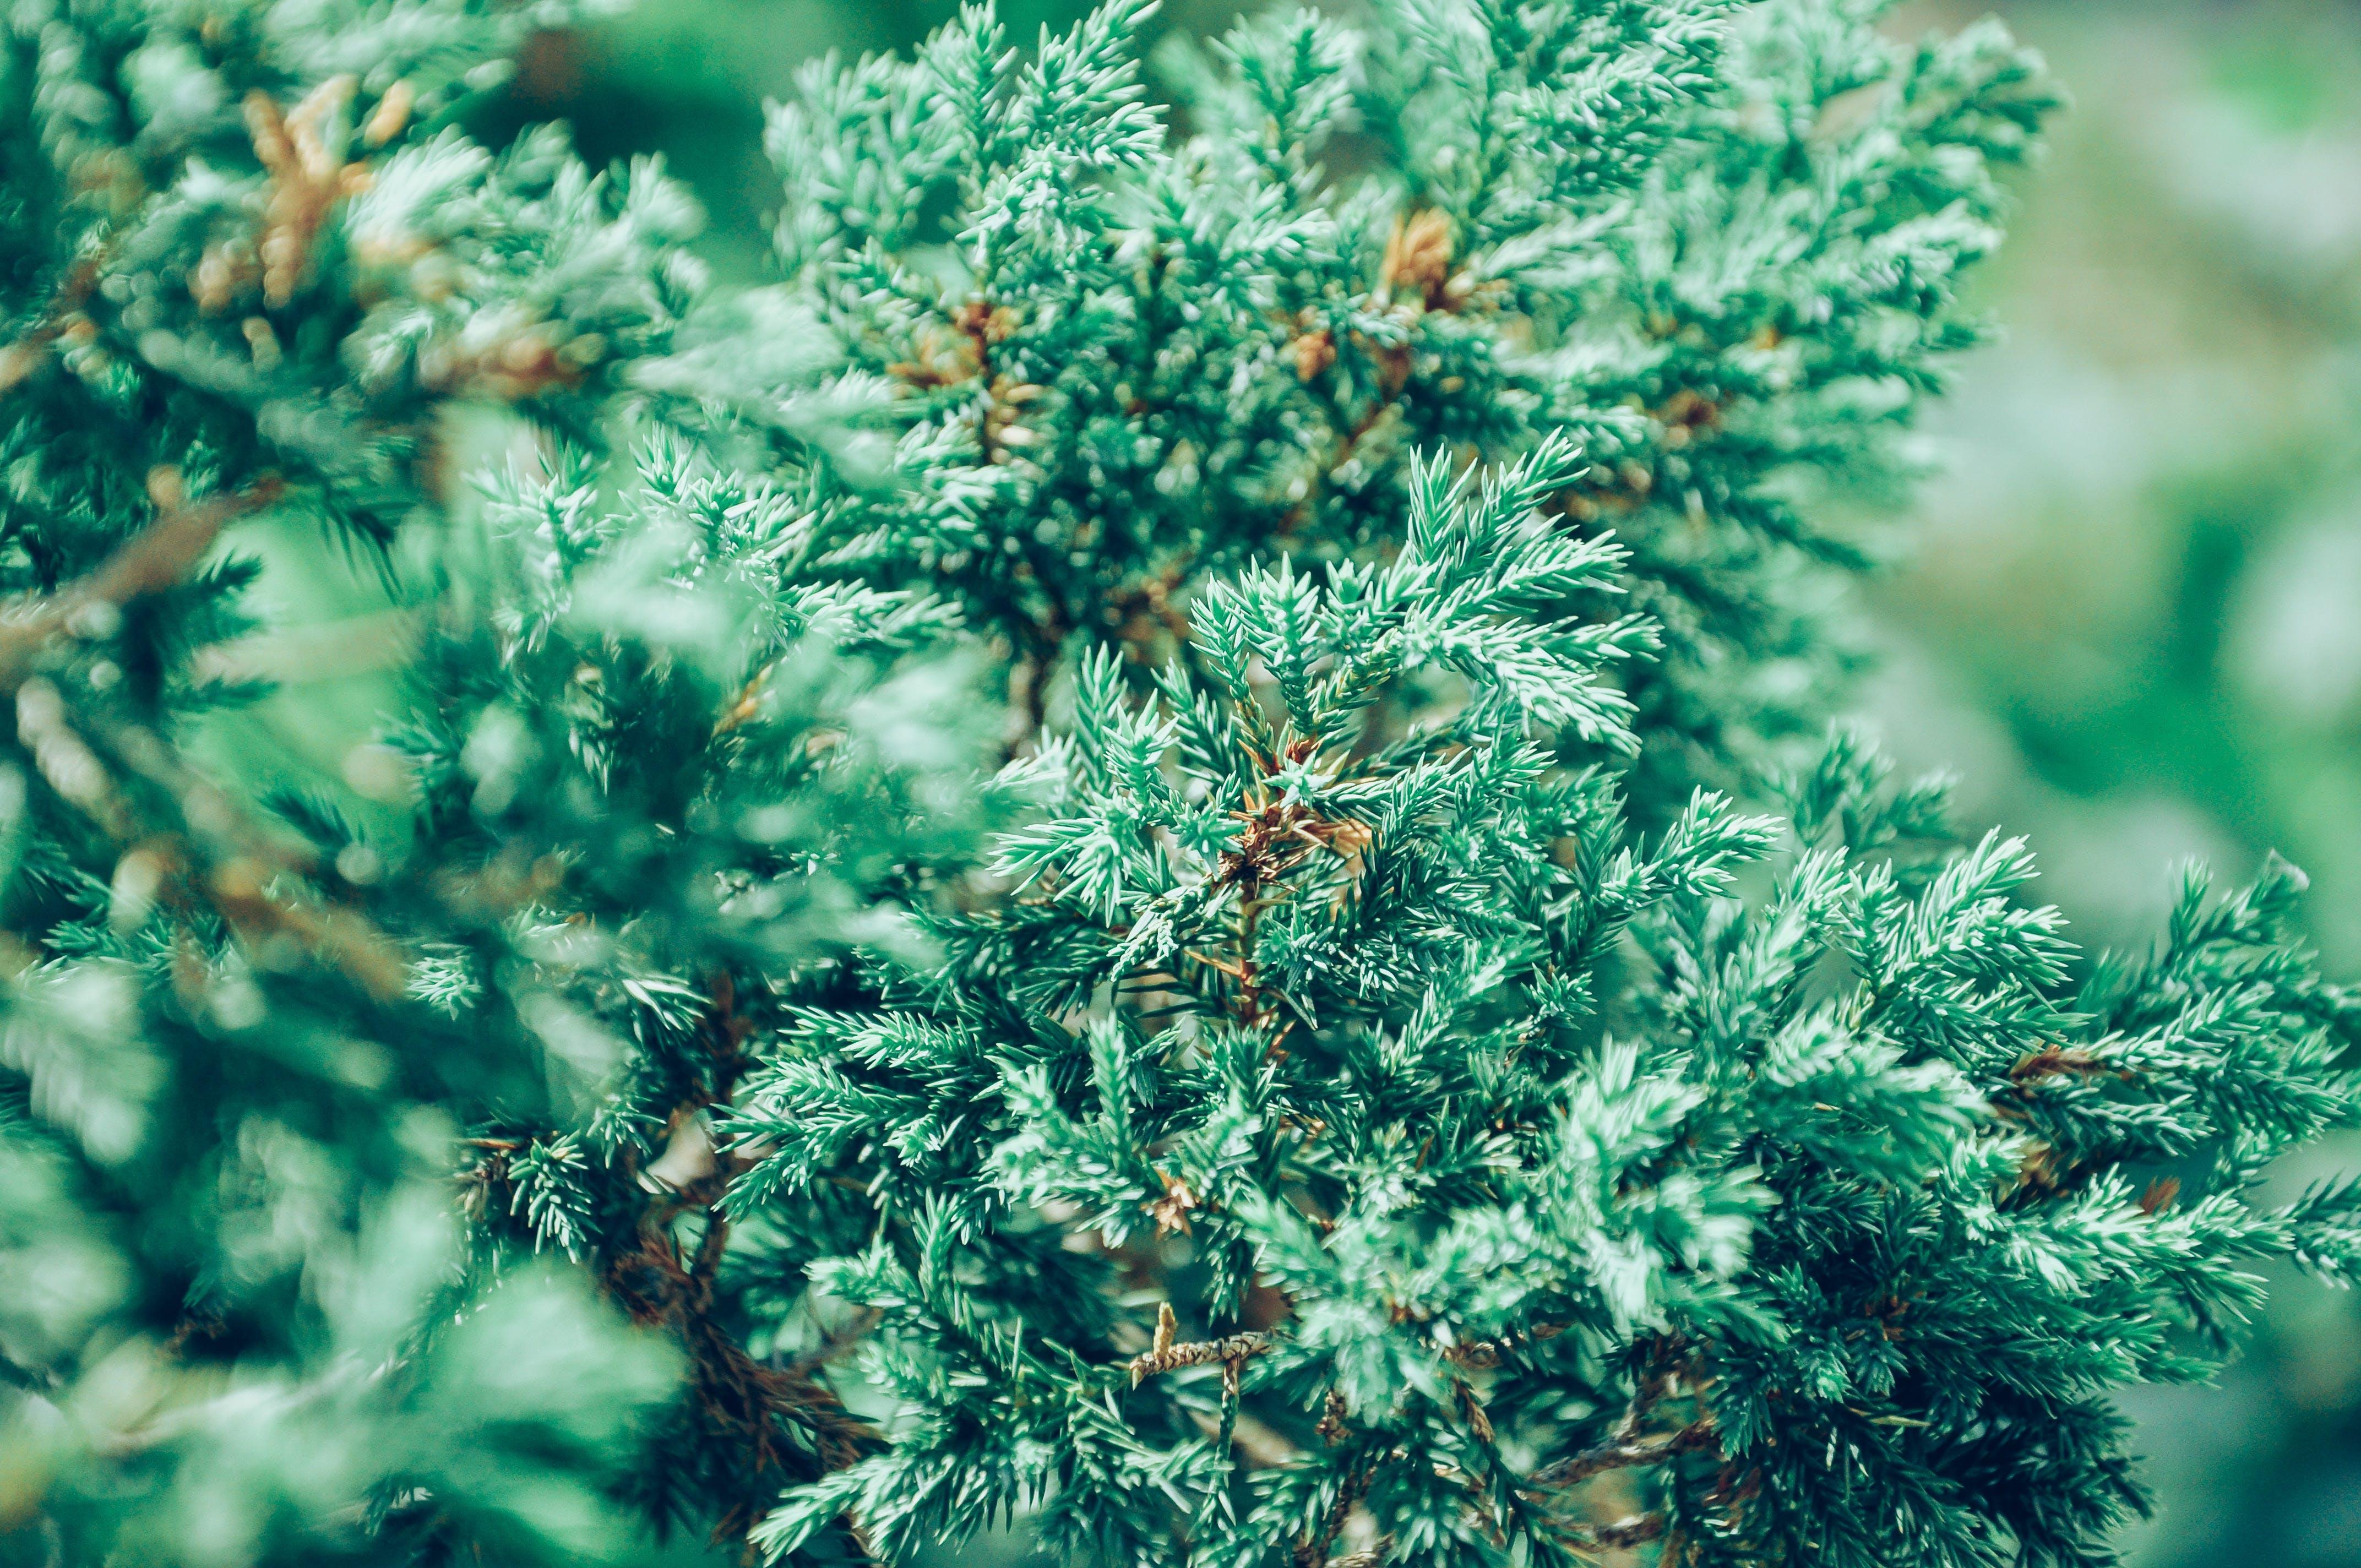 Green Pine Tree Selective Focus Photography